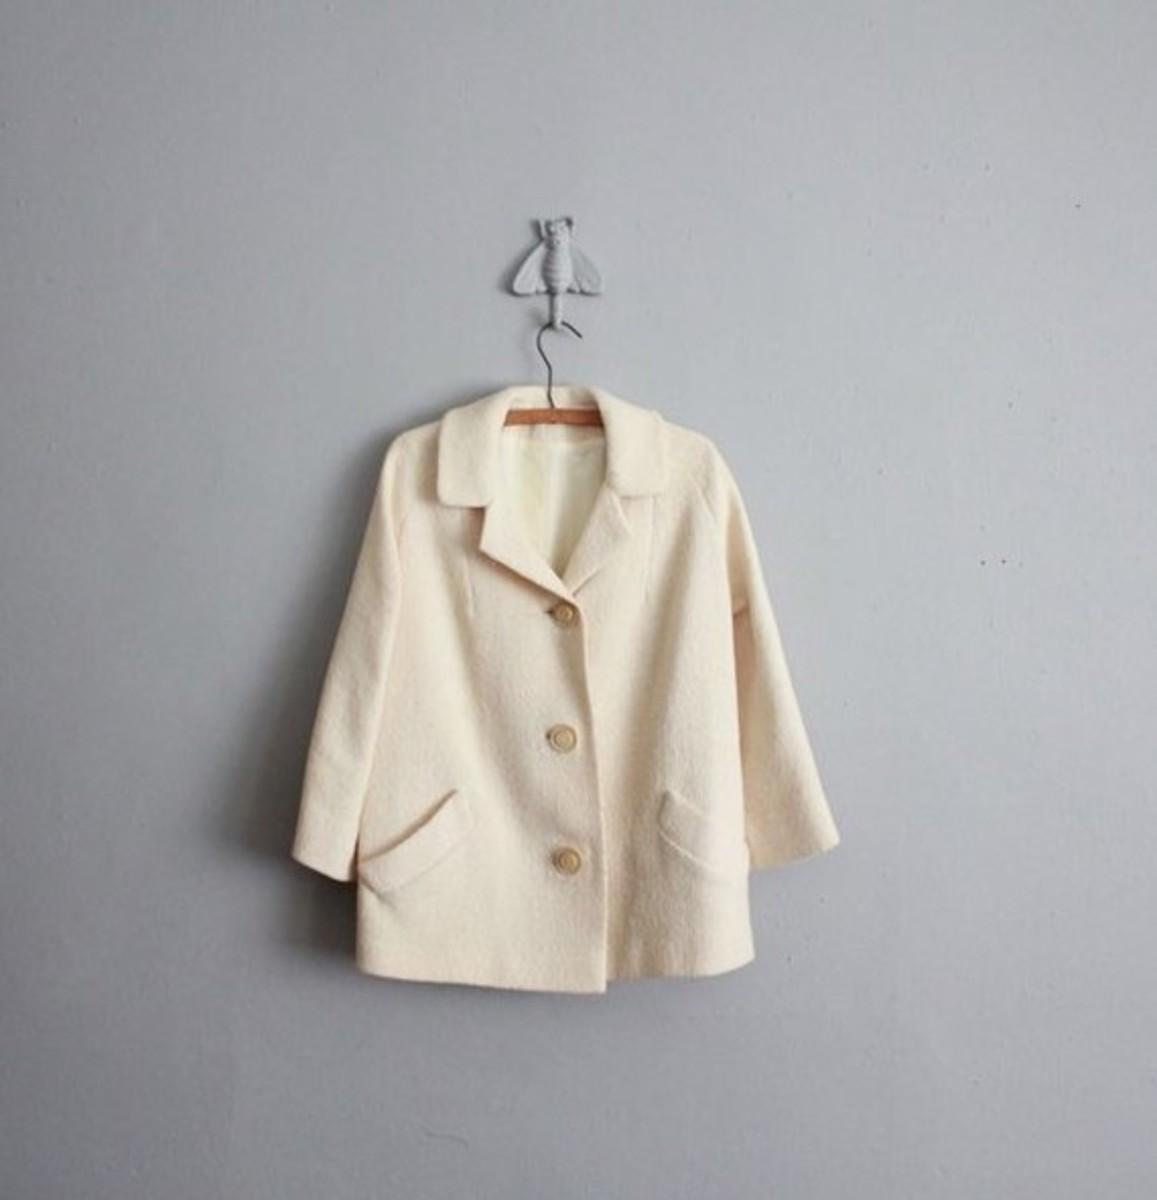 Vintage Vanilla Coat for sale by Allen Company Inc on etsy.com